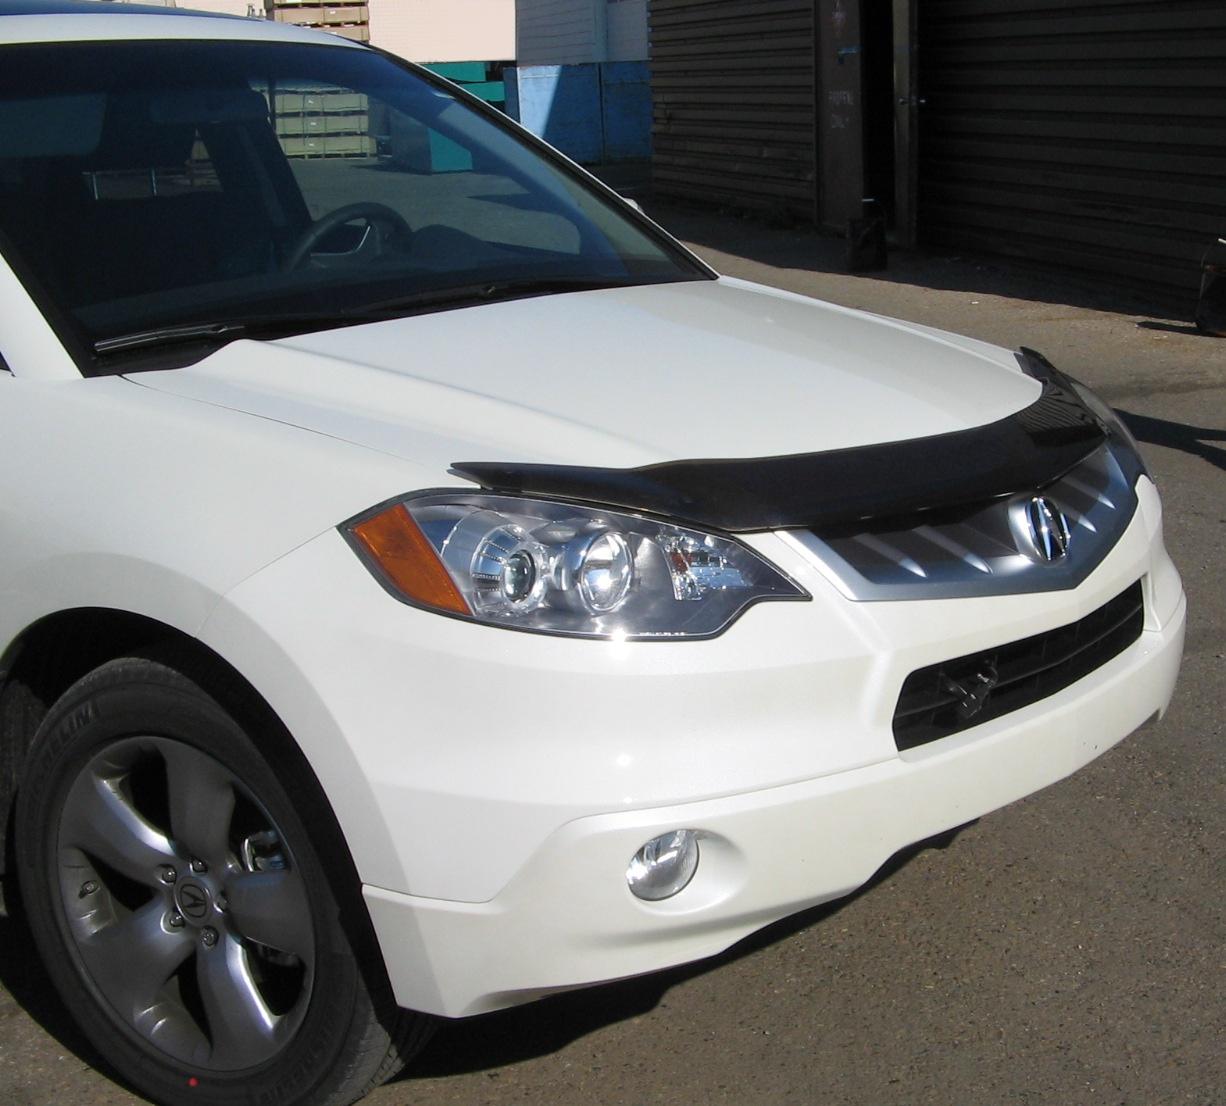 Acura RDX (2007-2009) FormFit Hood Protector